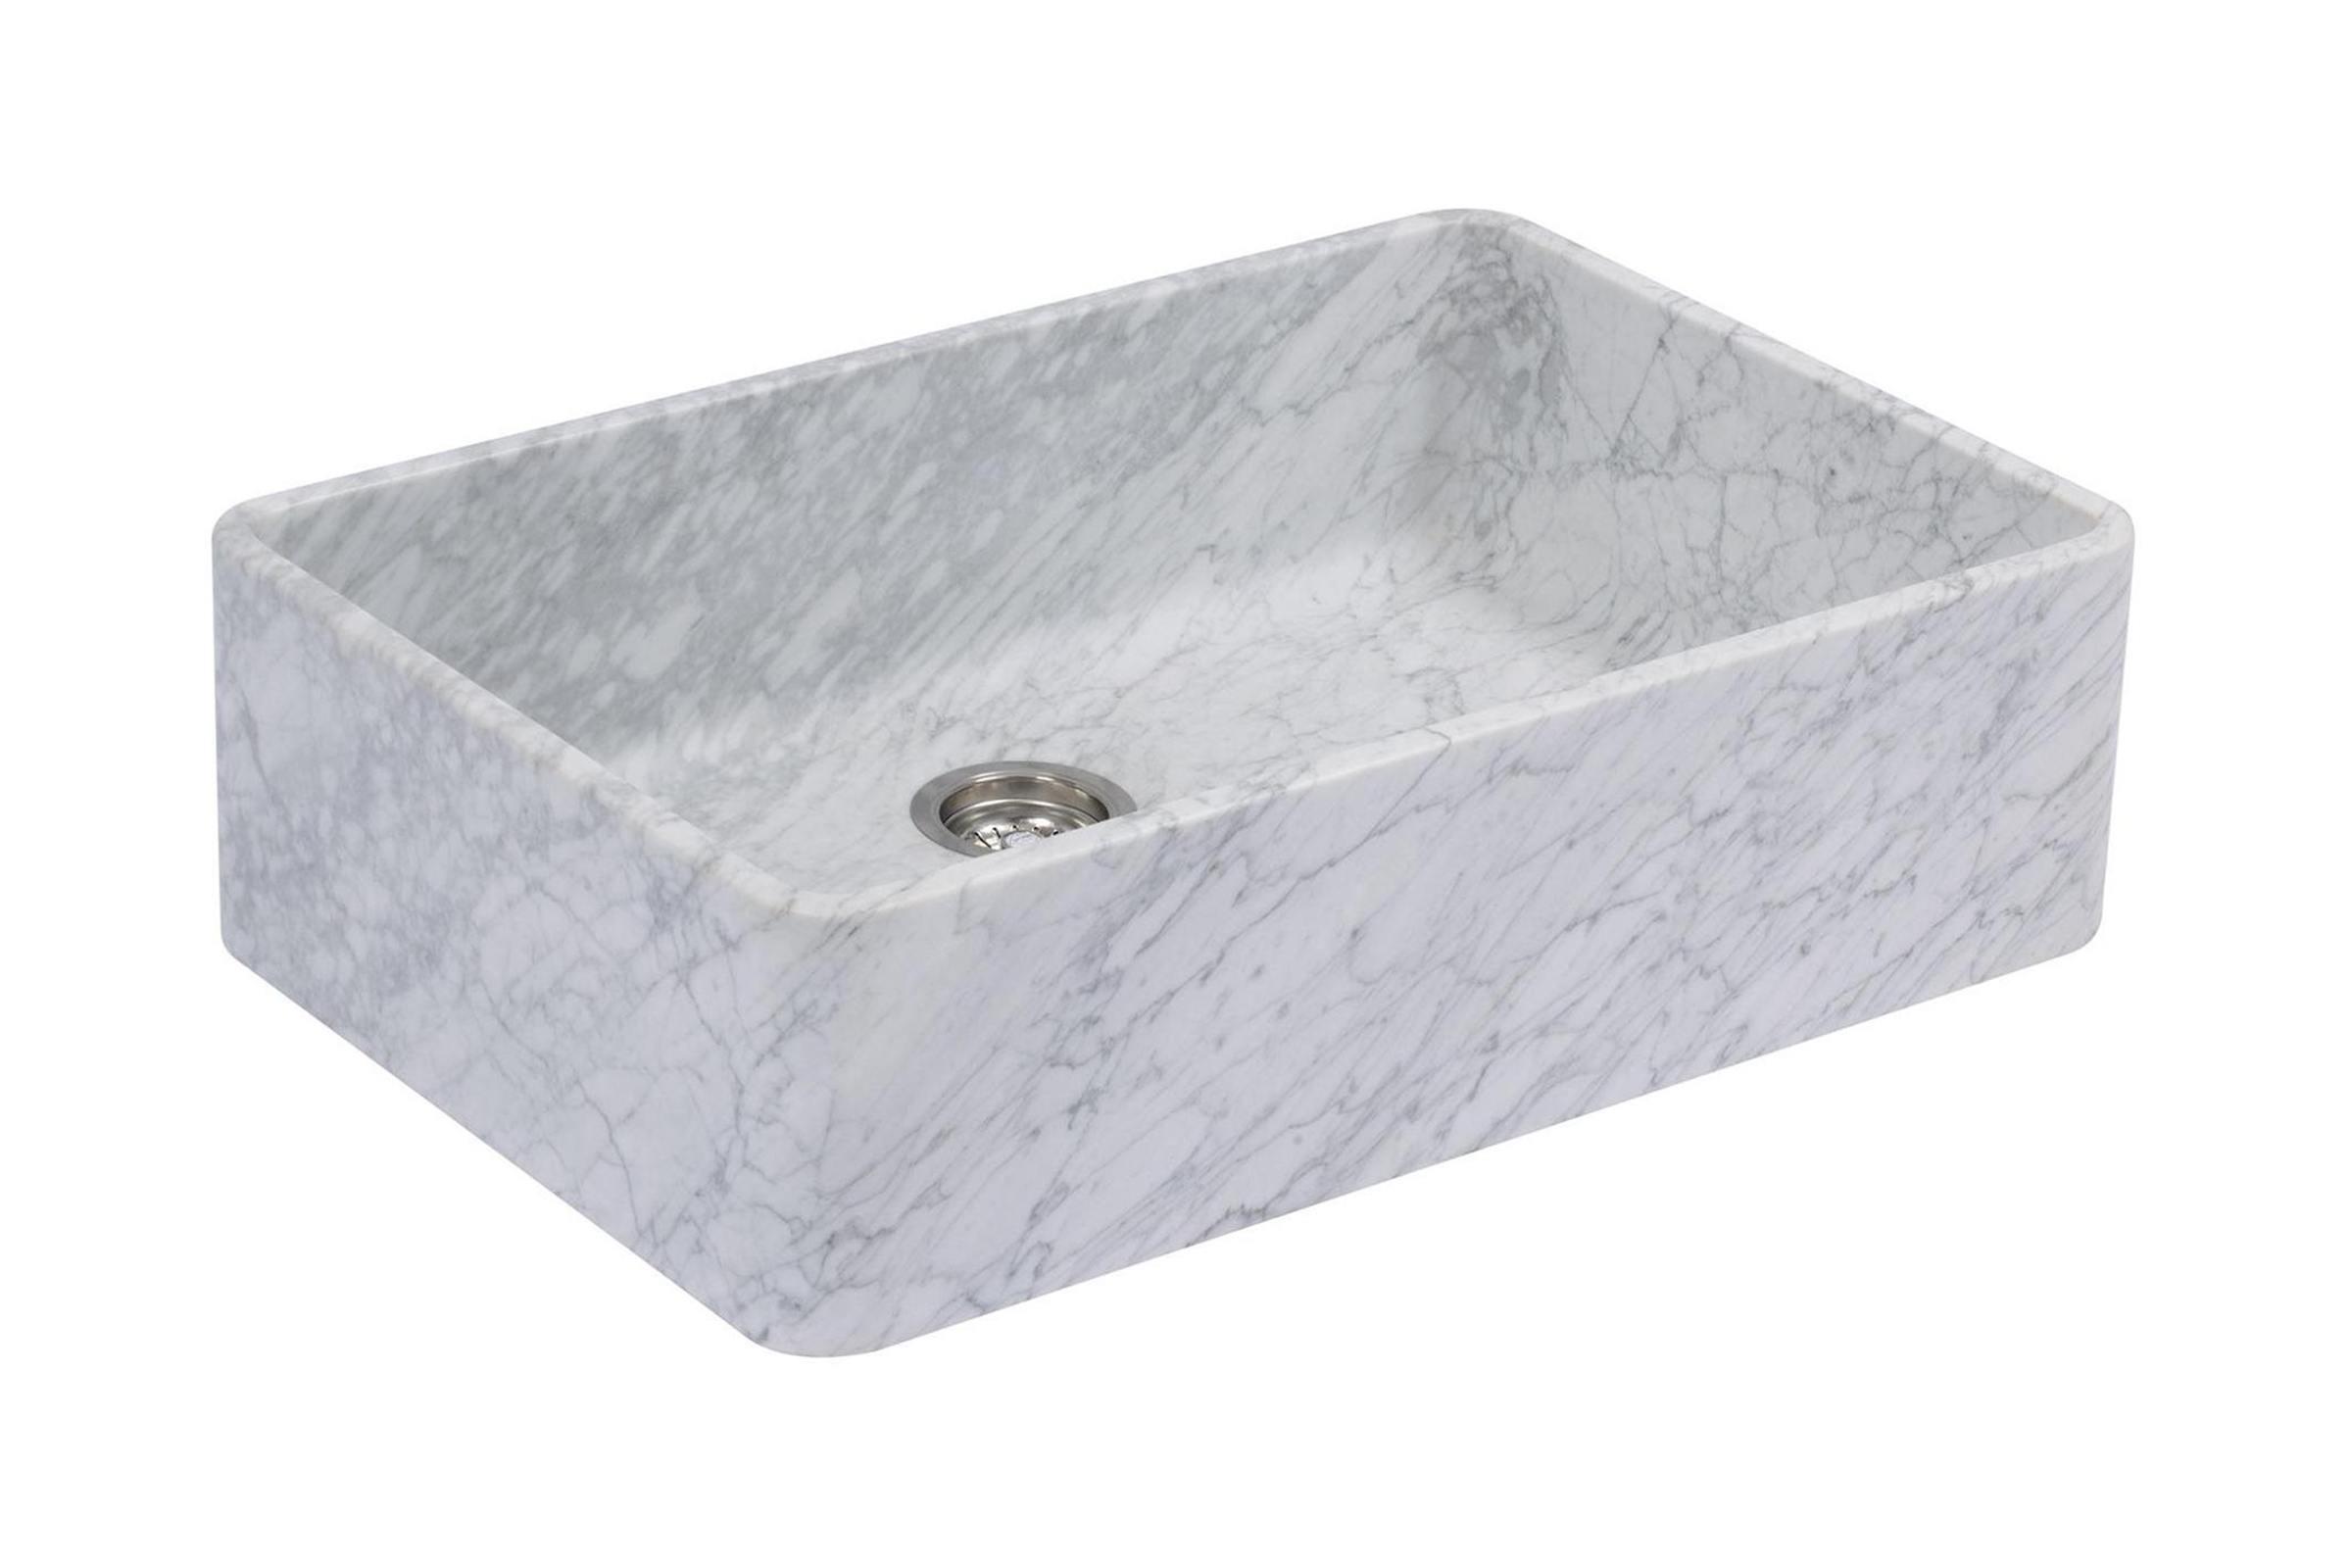 Milano Penthouse 31 1/2'' Single Marble Sink photo 1